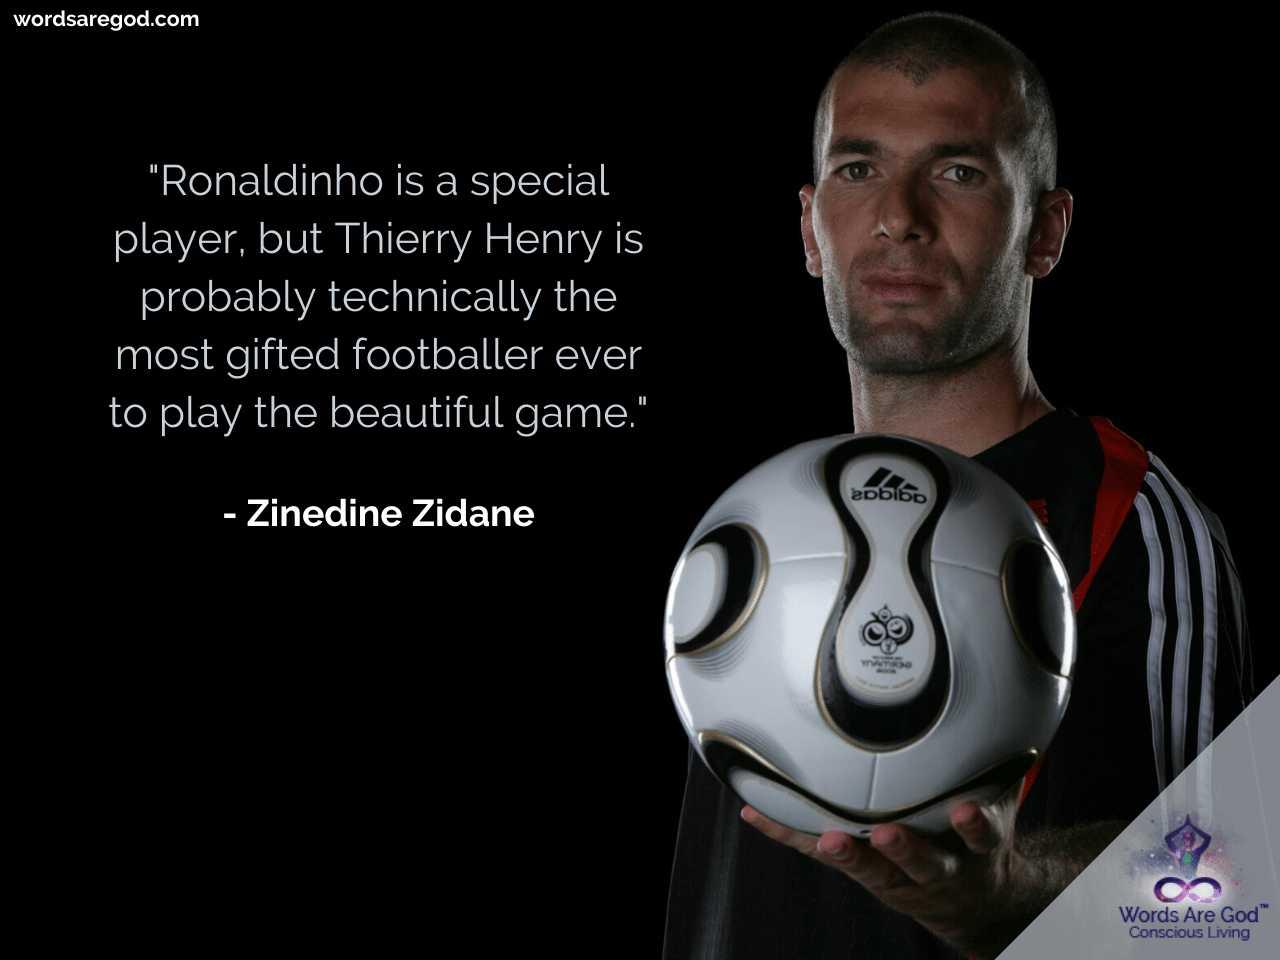 Zinedine Zidane Inspirational Quote